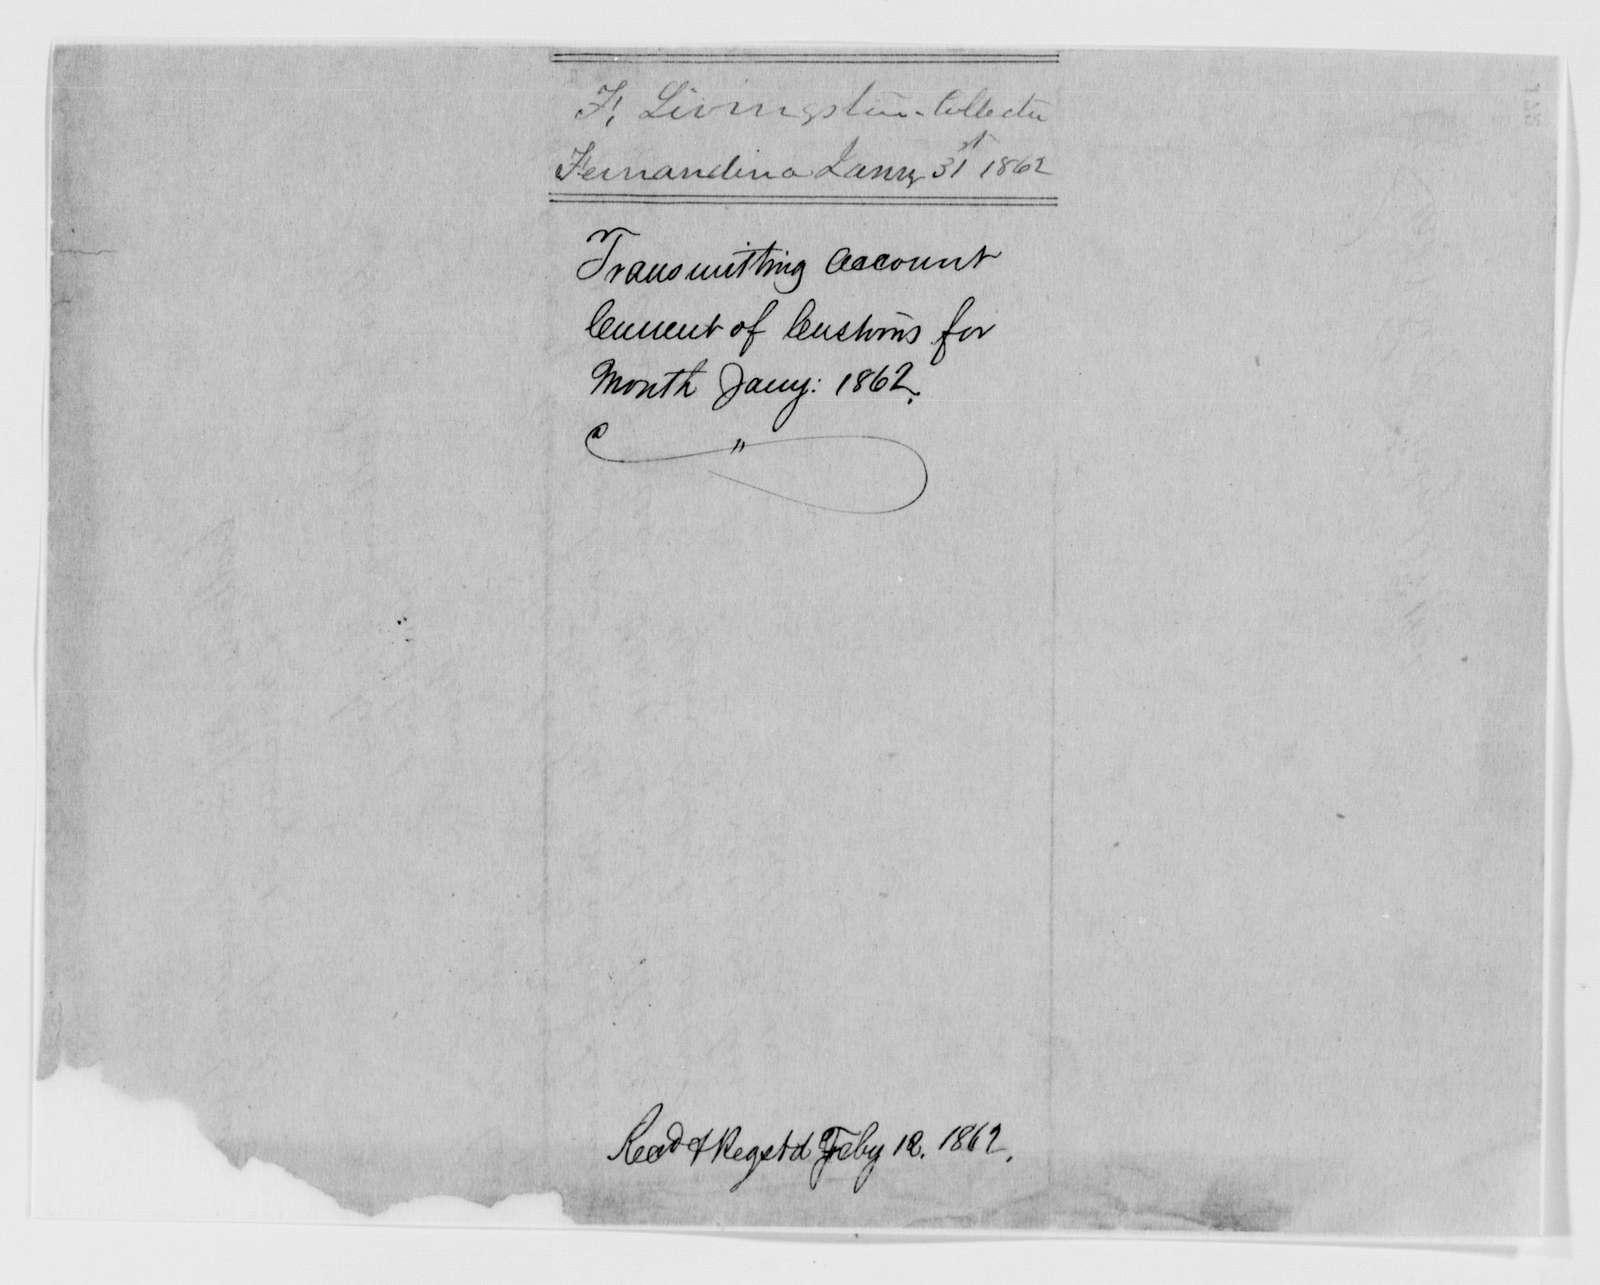 Confederate States of America records: Microfilm Reel 40